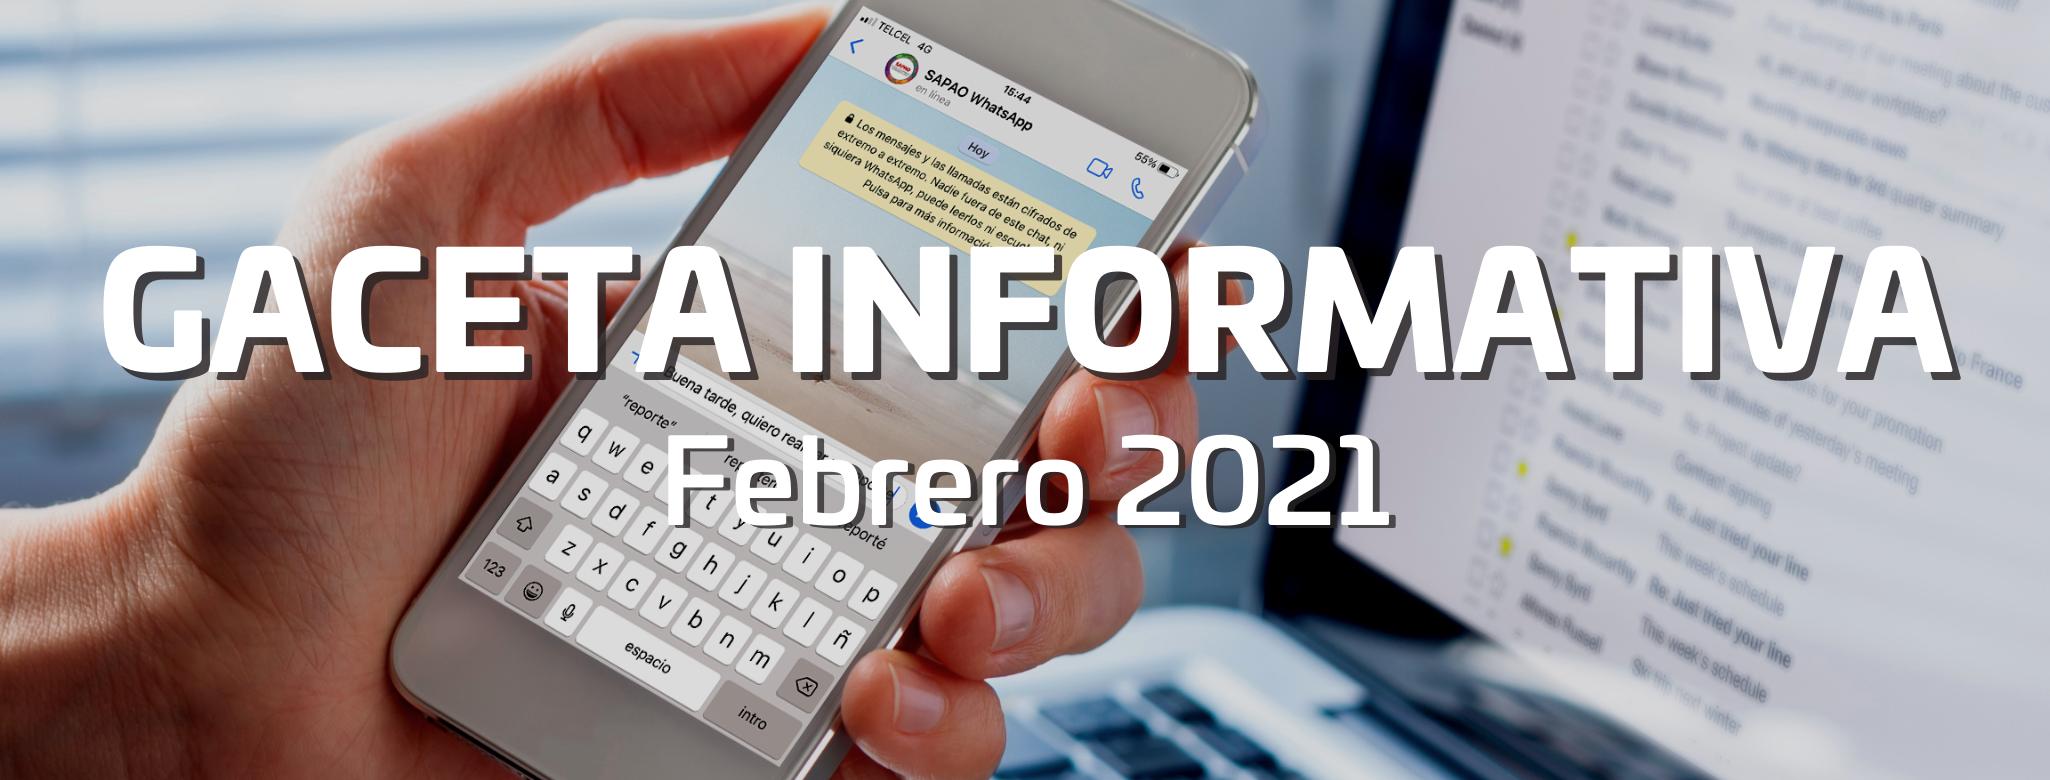 Gaceta informativa febrero 2021